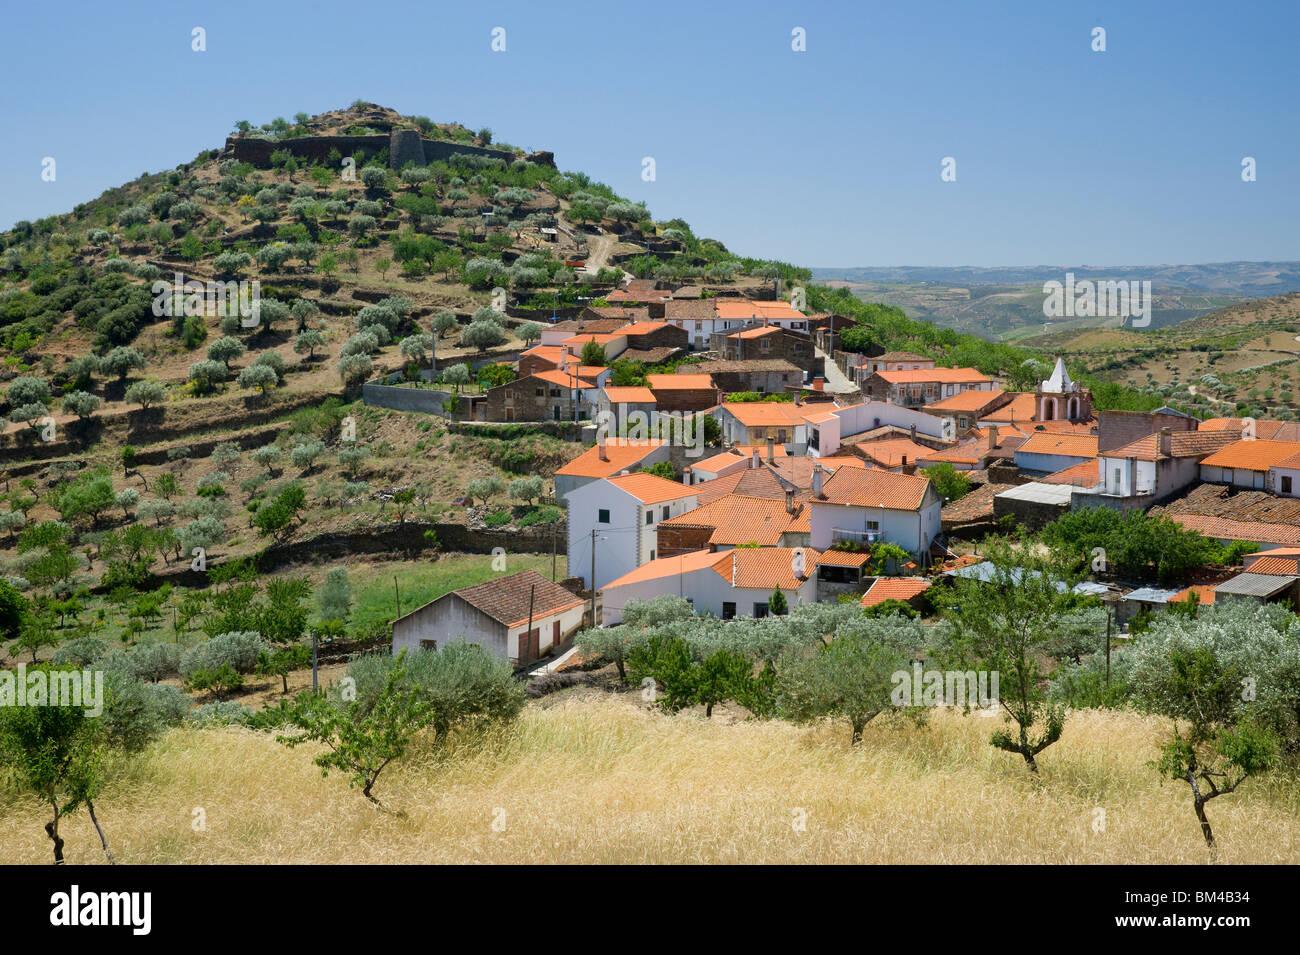 Portugal, The Beira Alta District Of Central Portugal, Castelo Melhor Stock Photo, Royalty Free